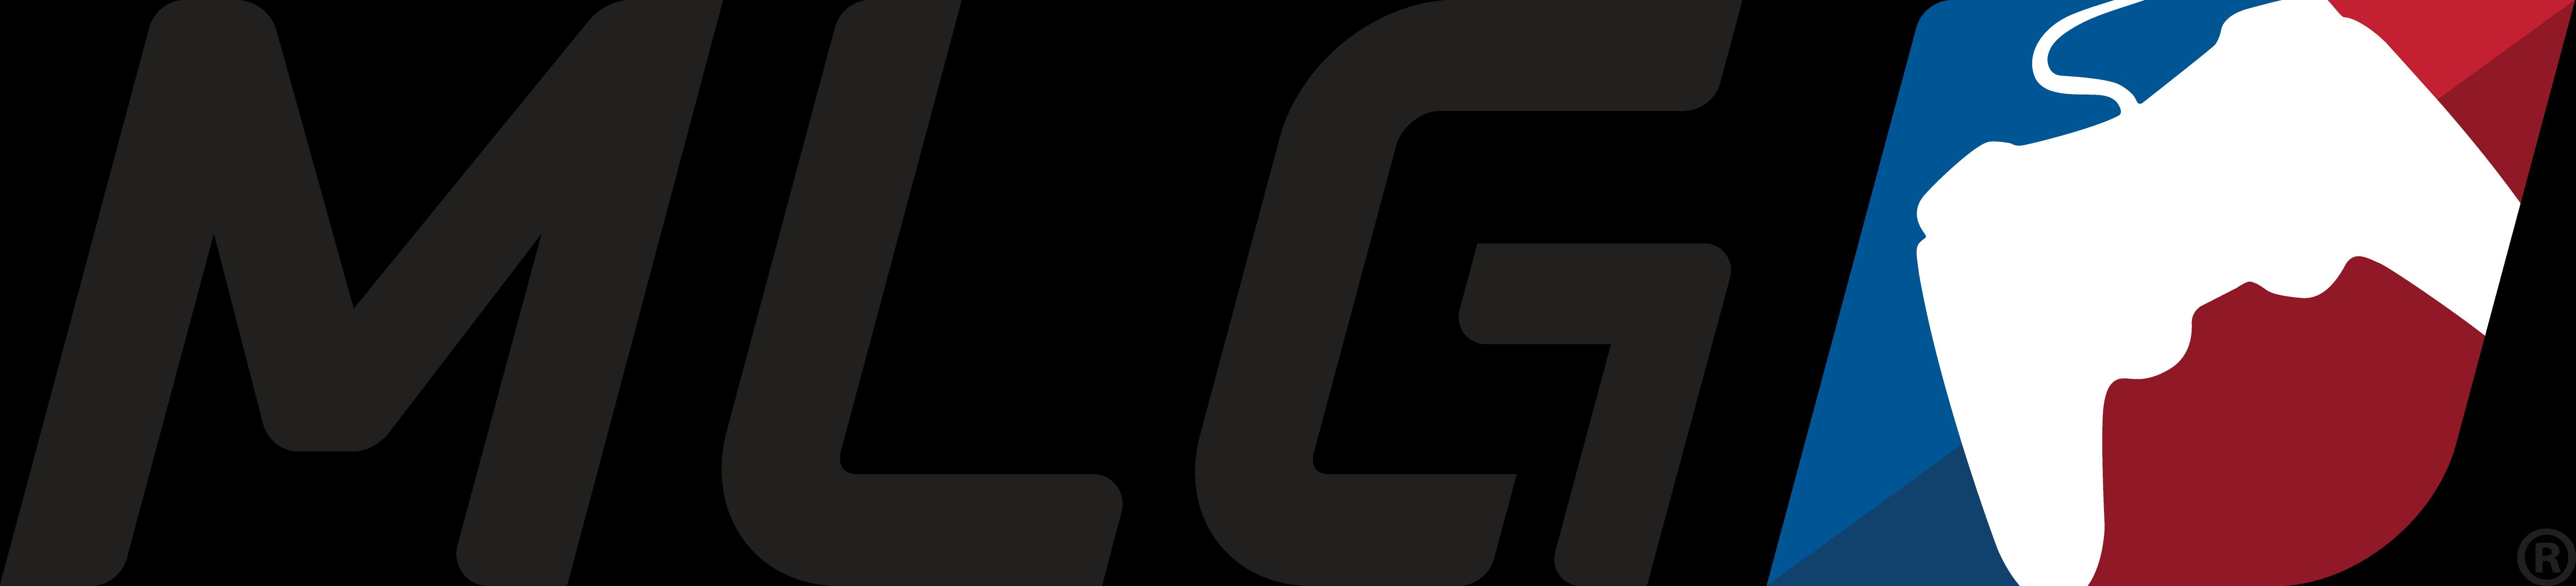 Mlg logo clipart image transparent download Mlg logo png clipart images gallery for free download ... image transparent download